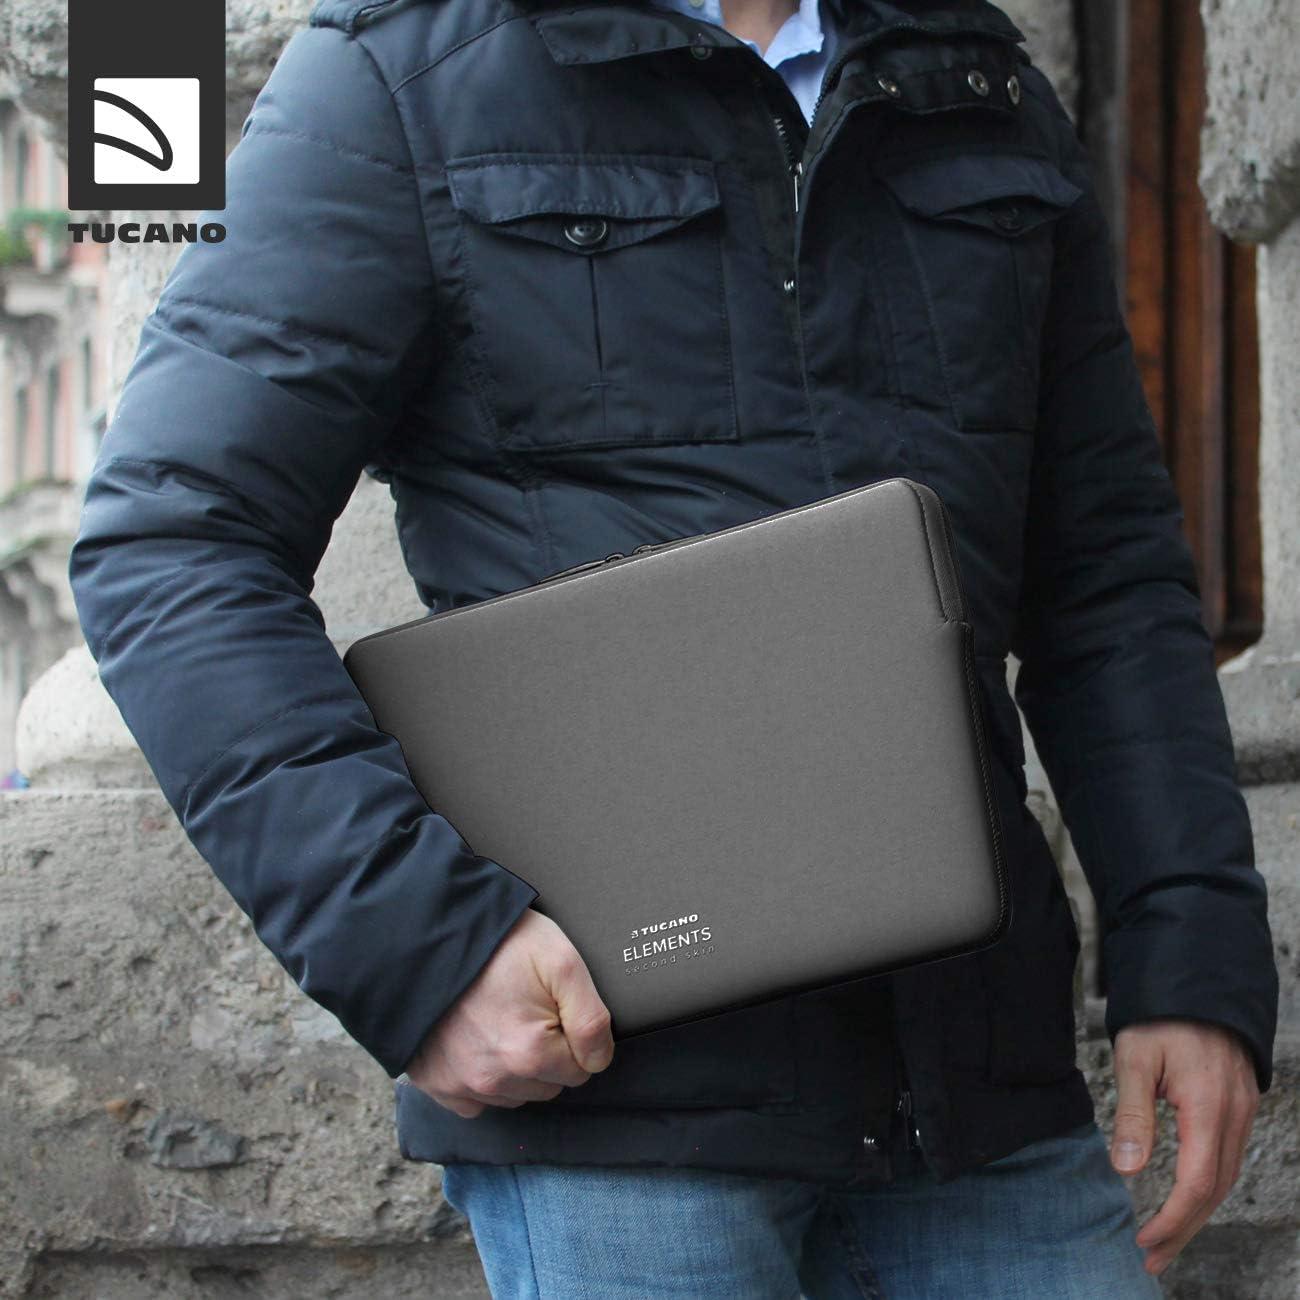 Tucano Bf E Mb13 Second Skin New Elements Case Macbook Computer Zubehör